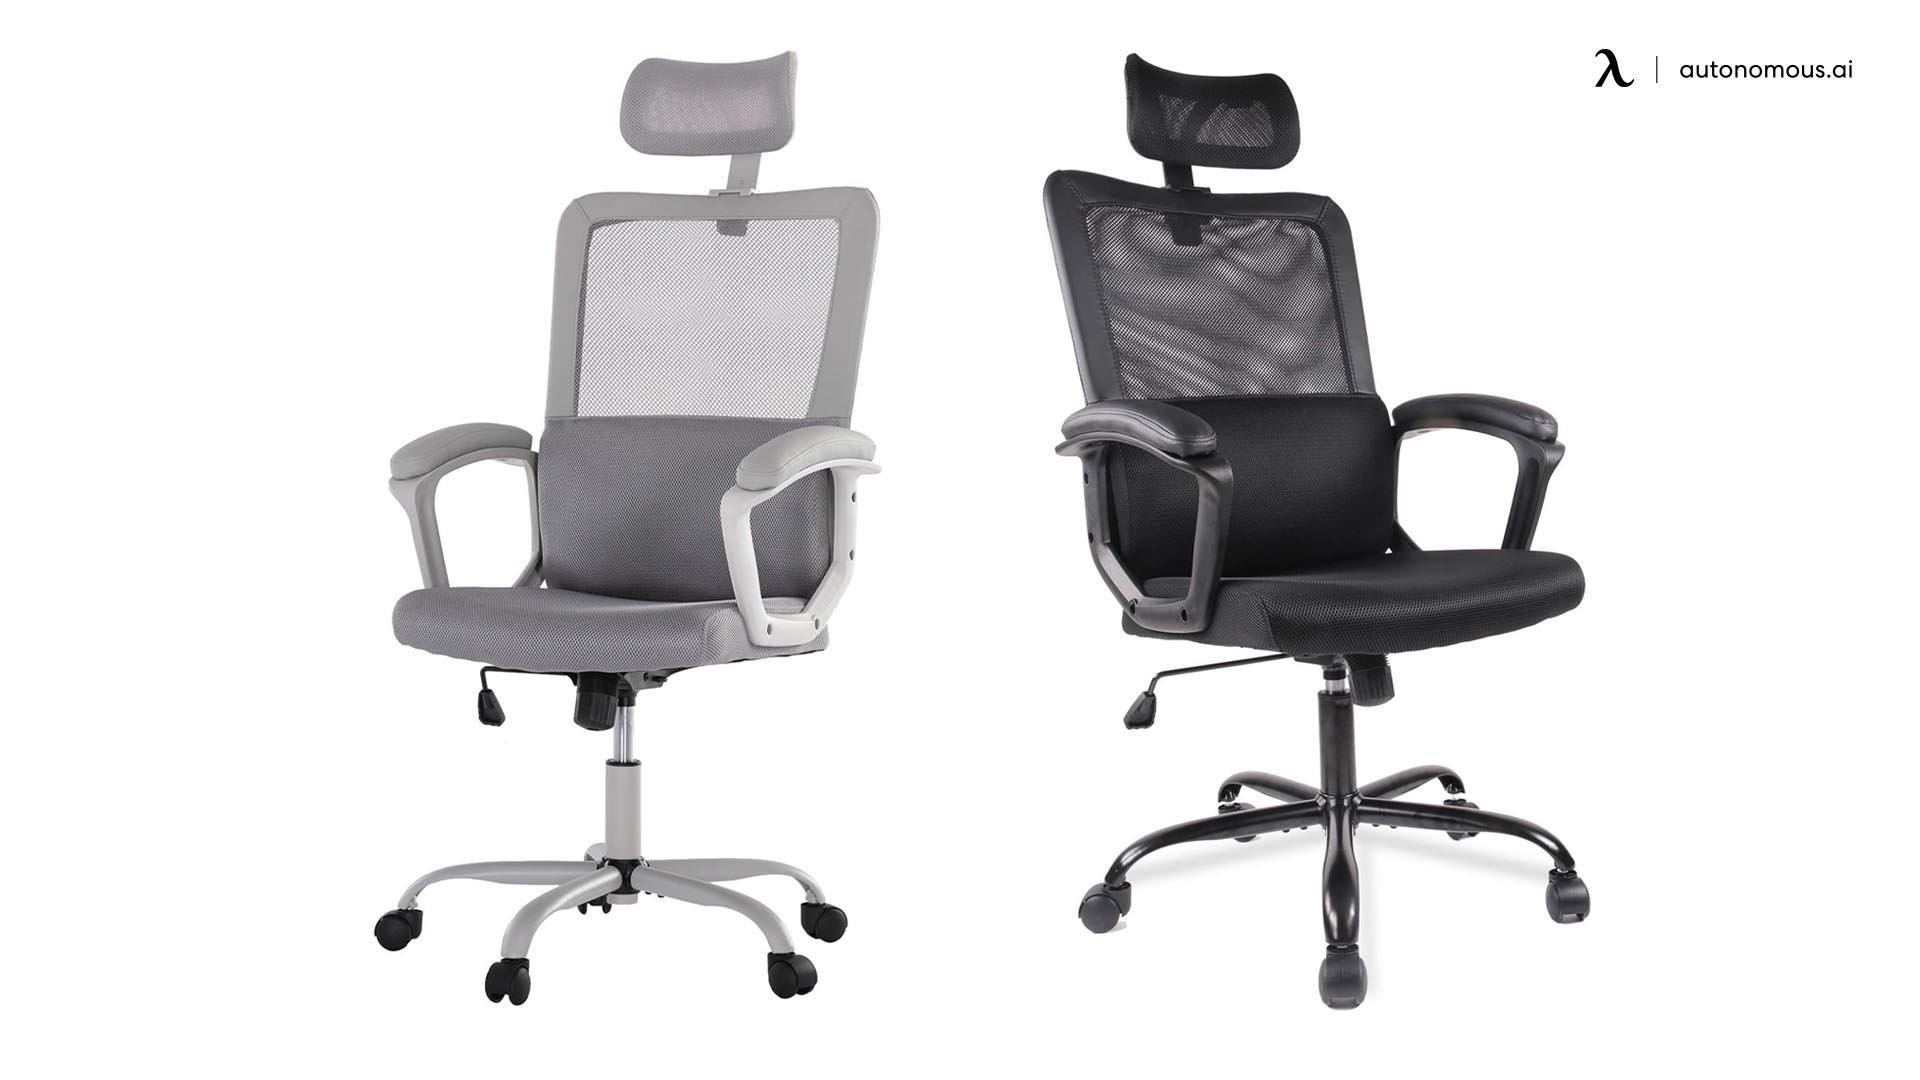 Smugdesk Office Chair